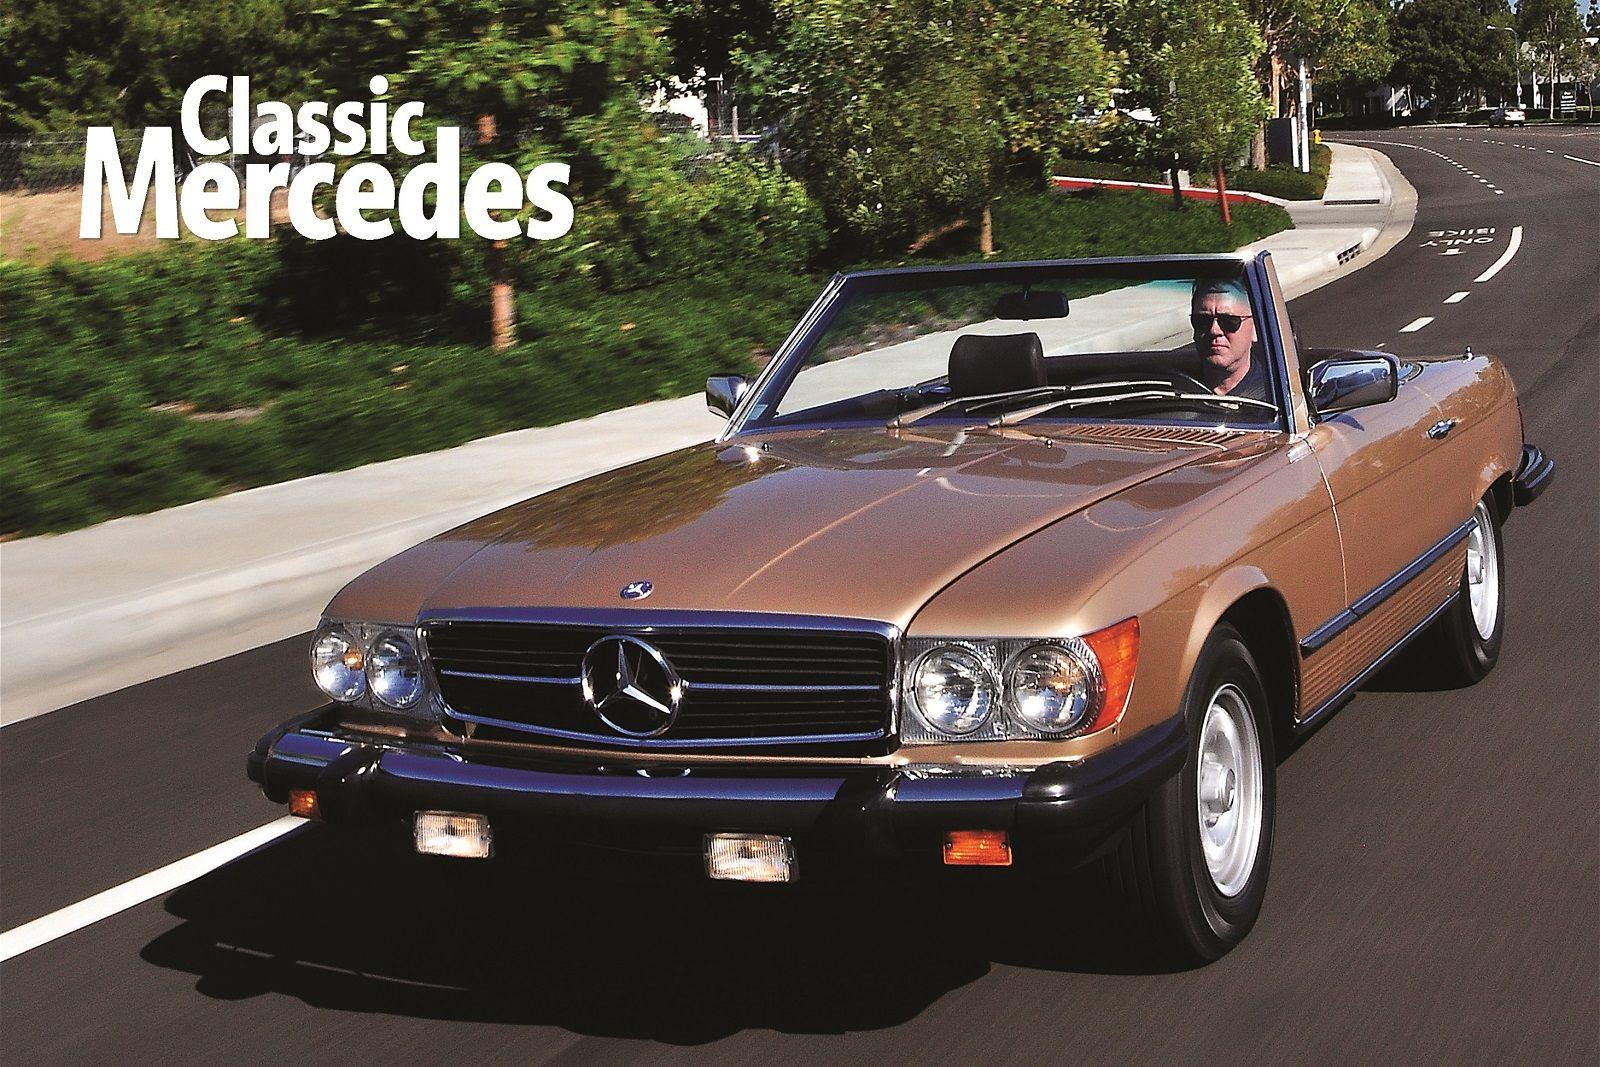 Pin by SabJoe on Benzfun to drive. Classic mercedes